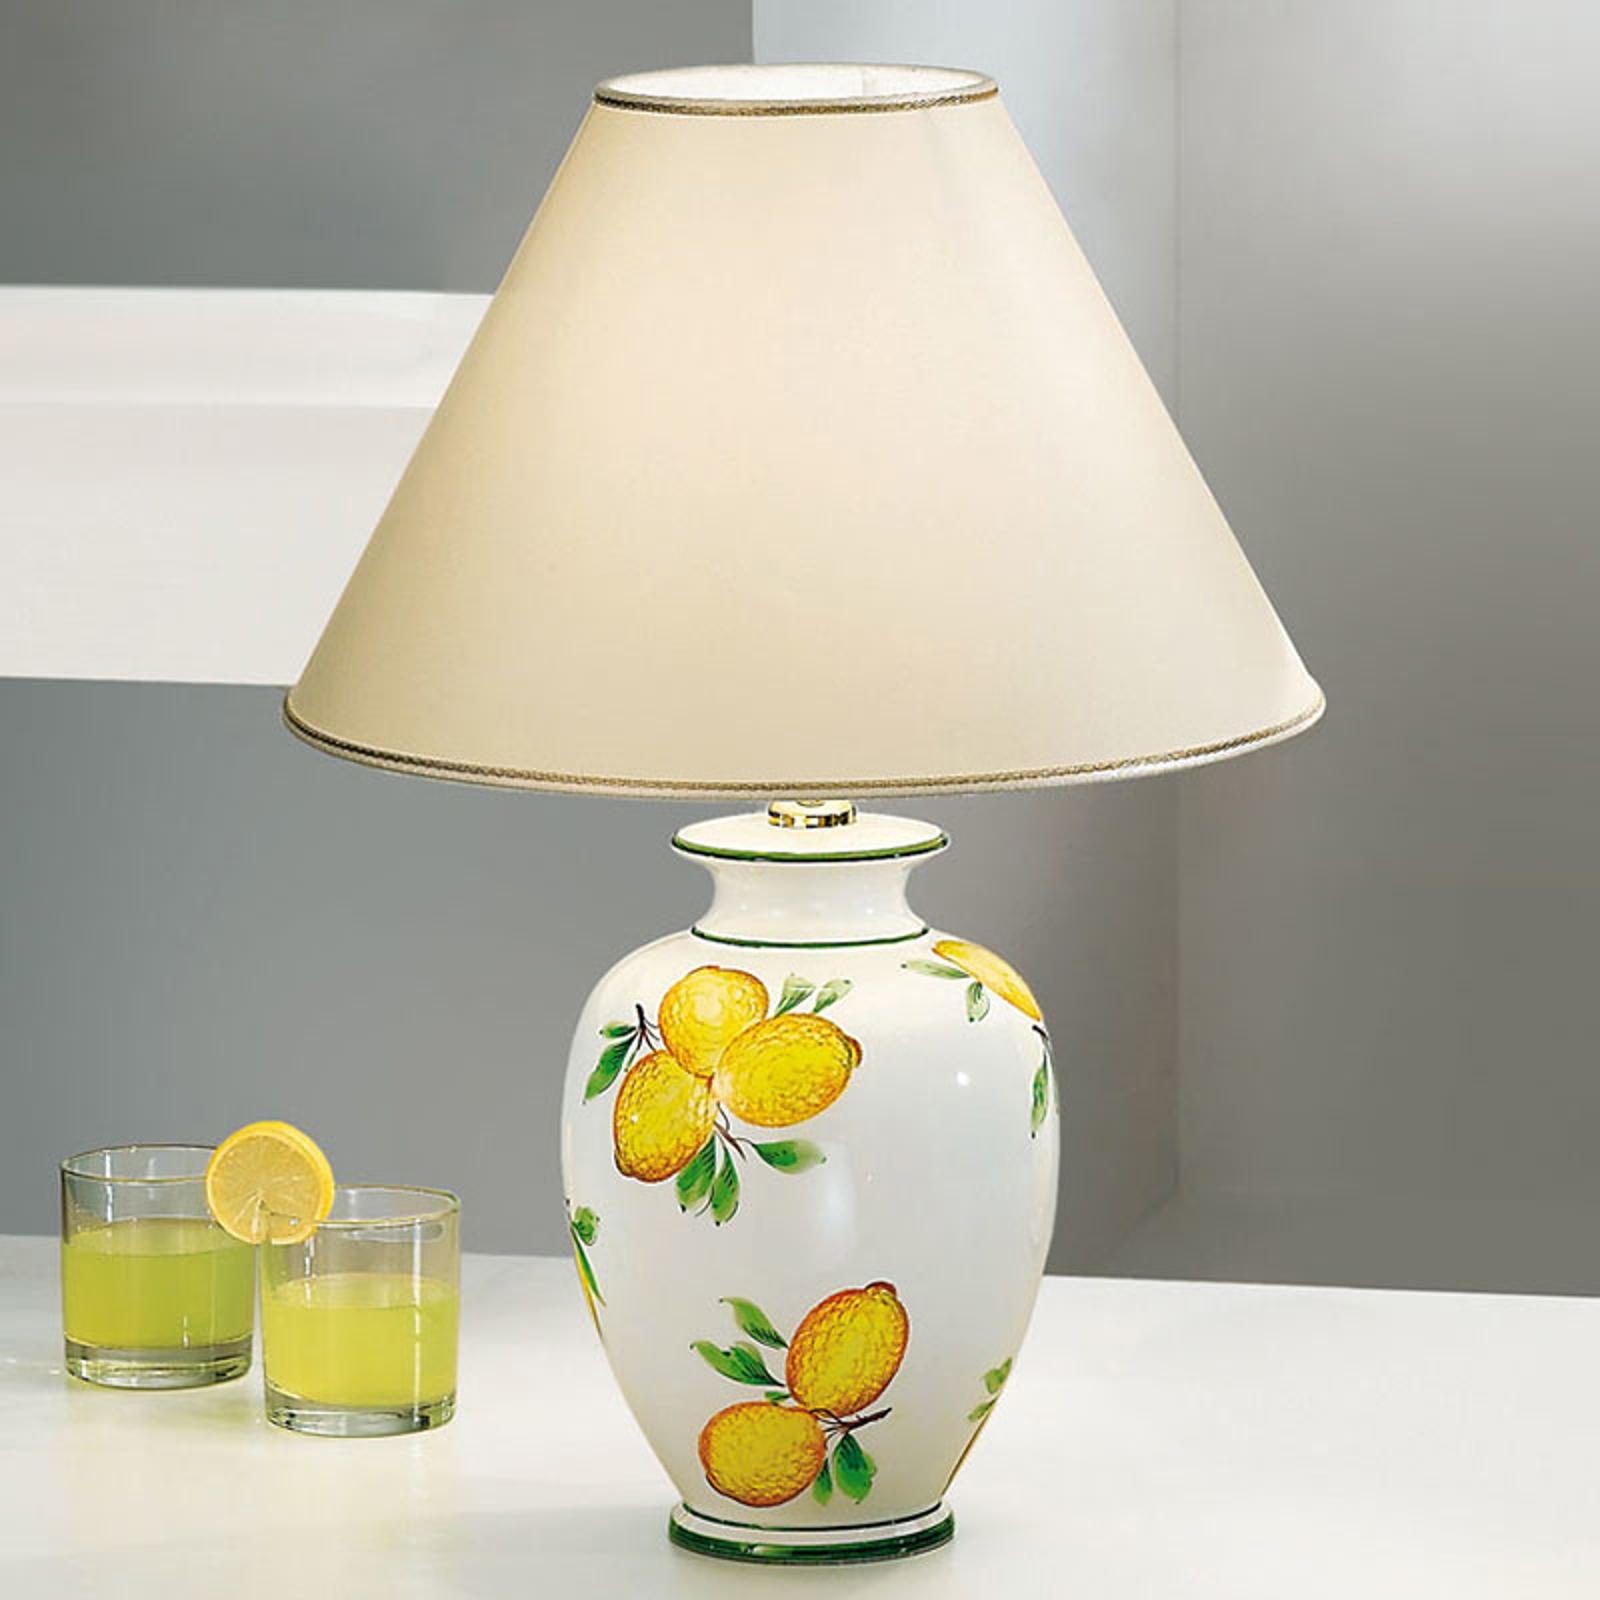 Tischleuchte Giardino Lemone, Ø 40 cm